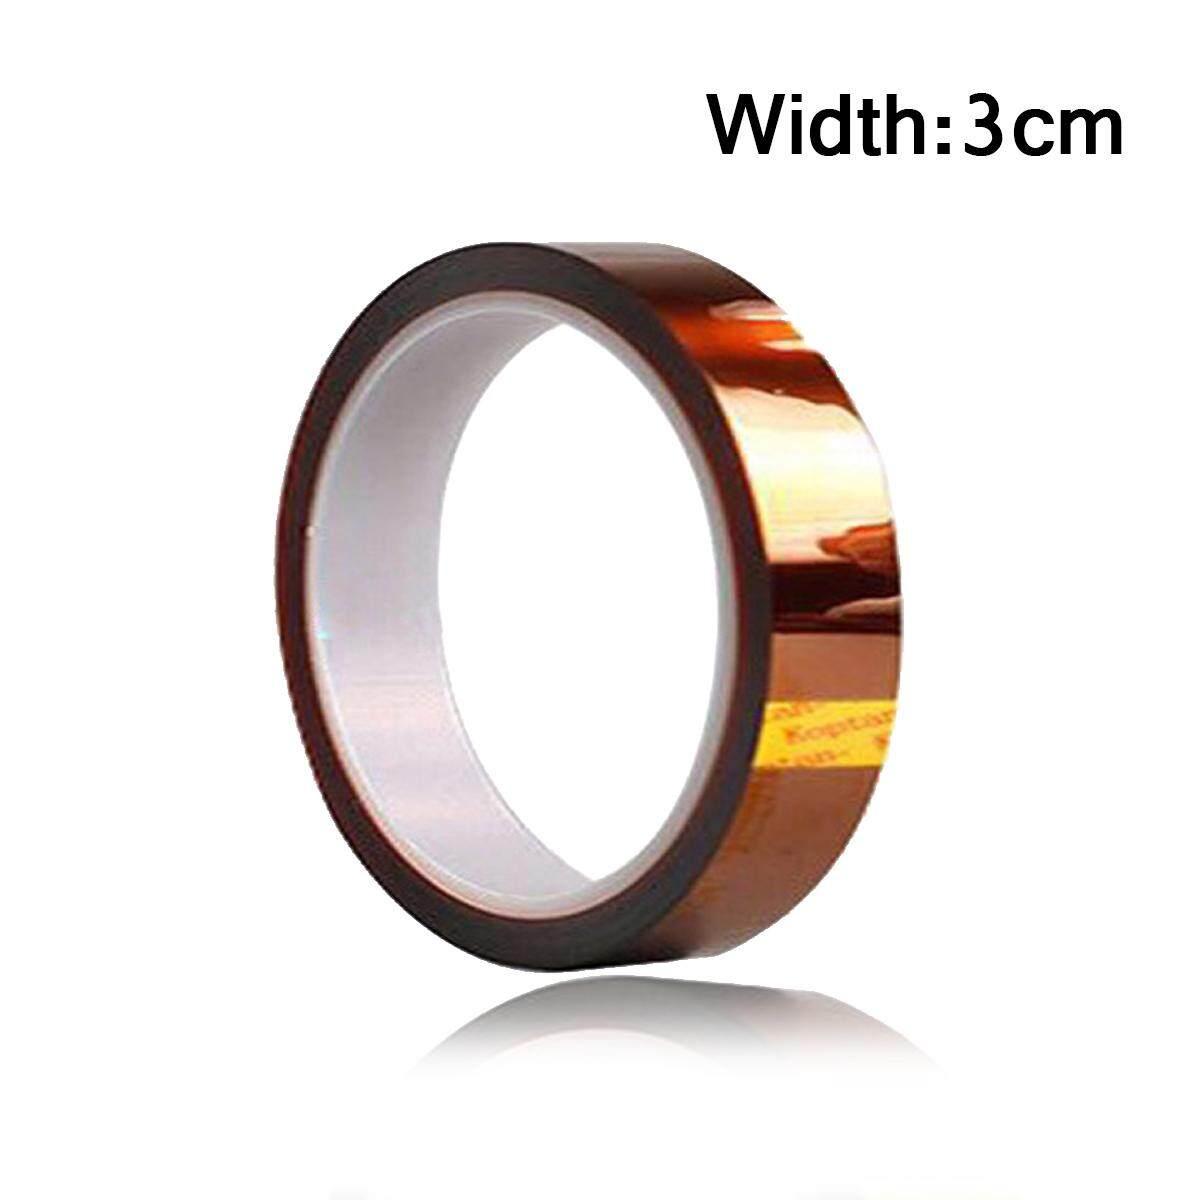 High Temperature Resistant Tape Polyimide Mobile Film Adhesive Tape for BGA SMT 1cm 3cm 5cm Width - 1cm/ 3cm/ 5cm